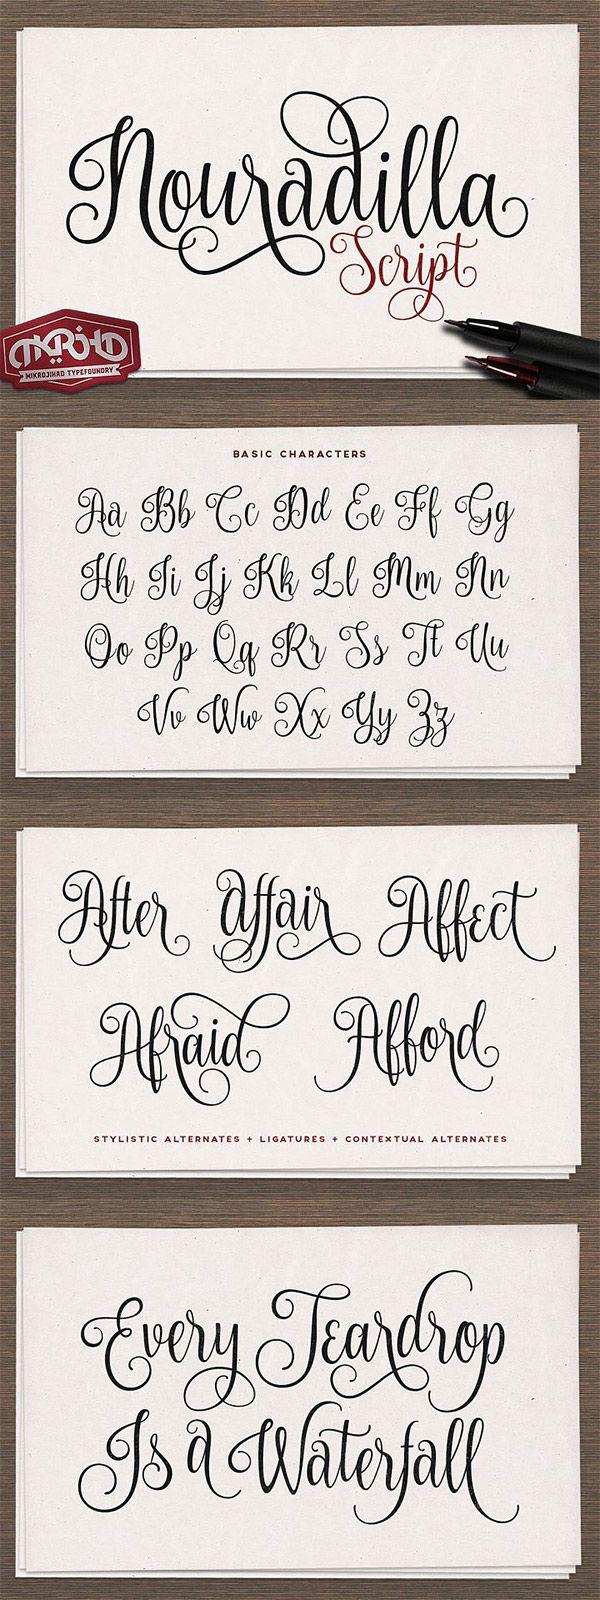 Nouradilla script is a brilliant calligraphy font that